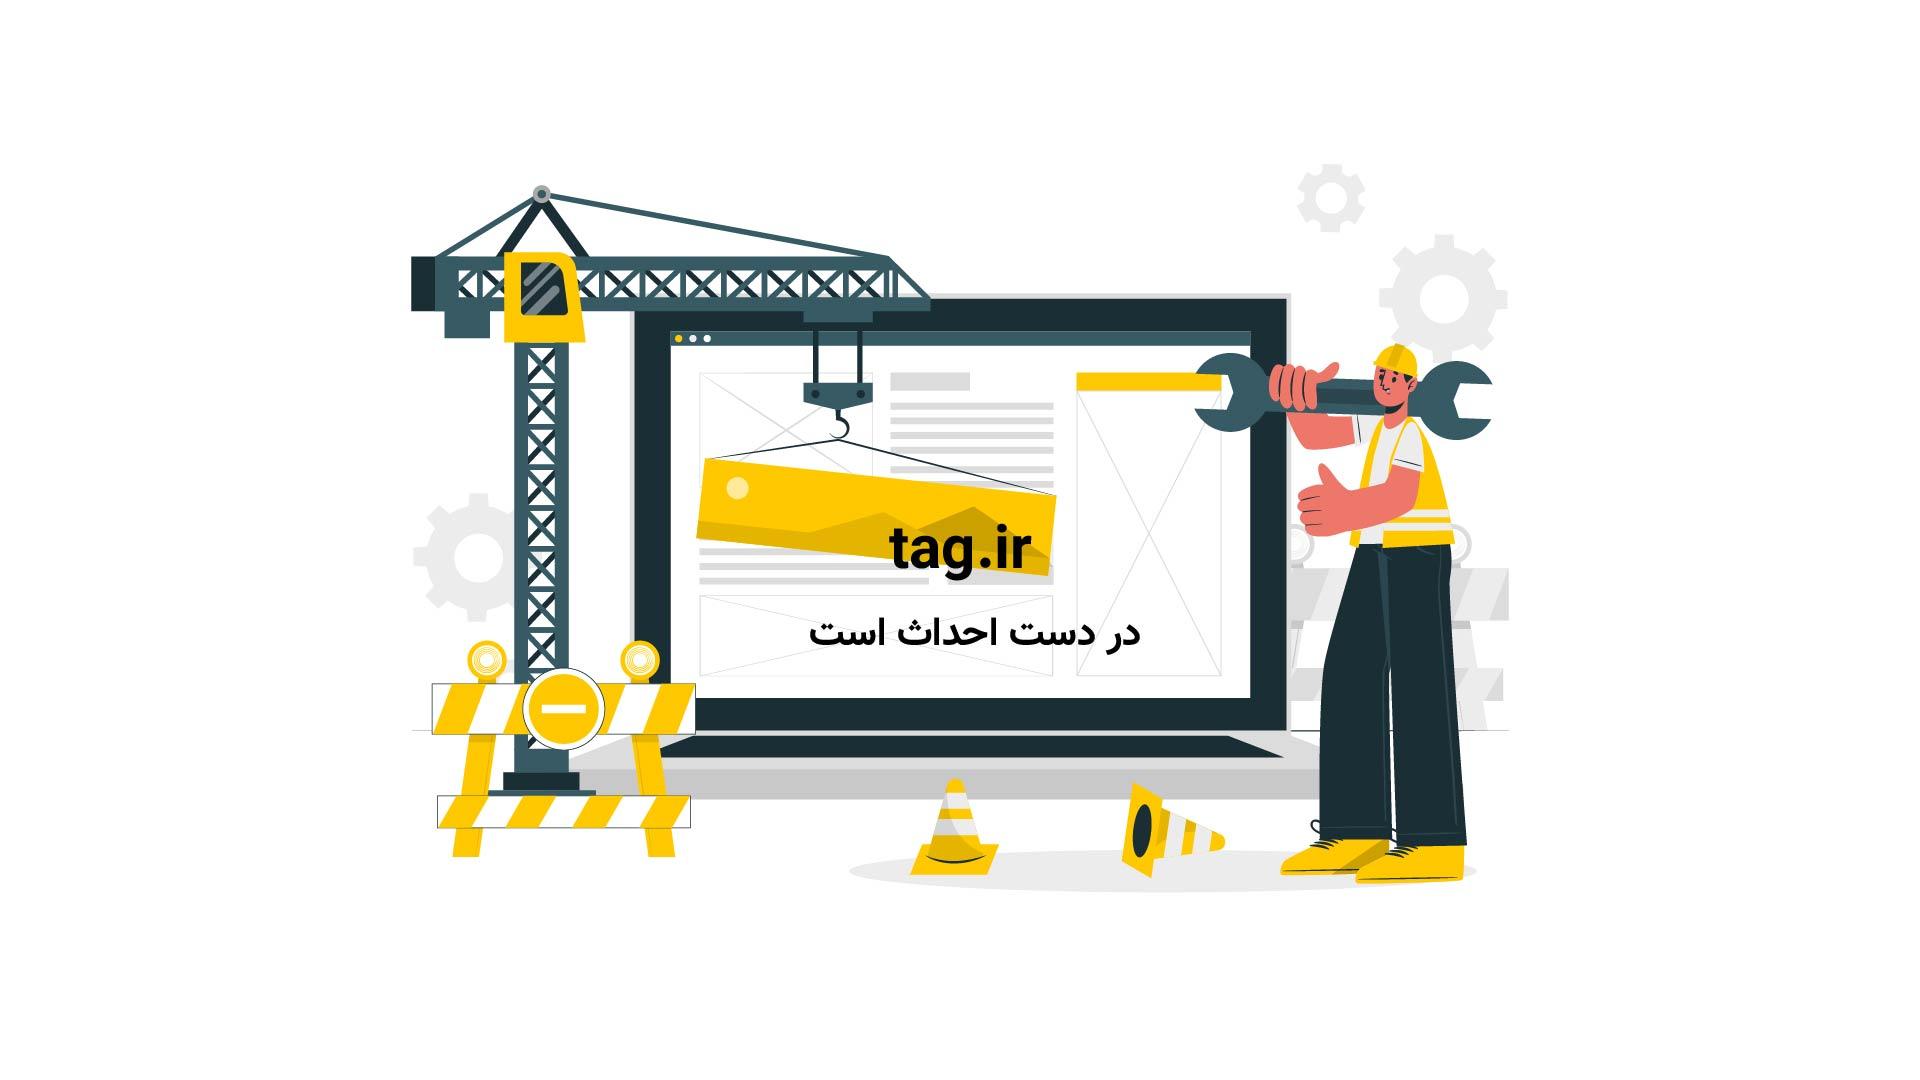 لوله پلاستیکی | تگ